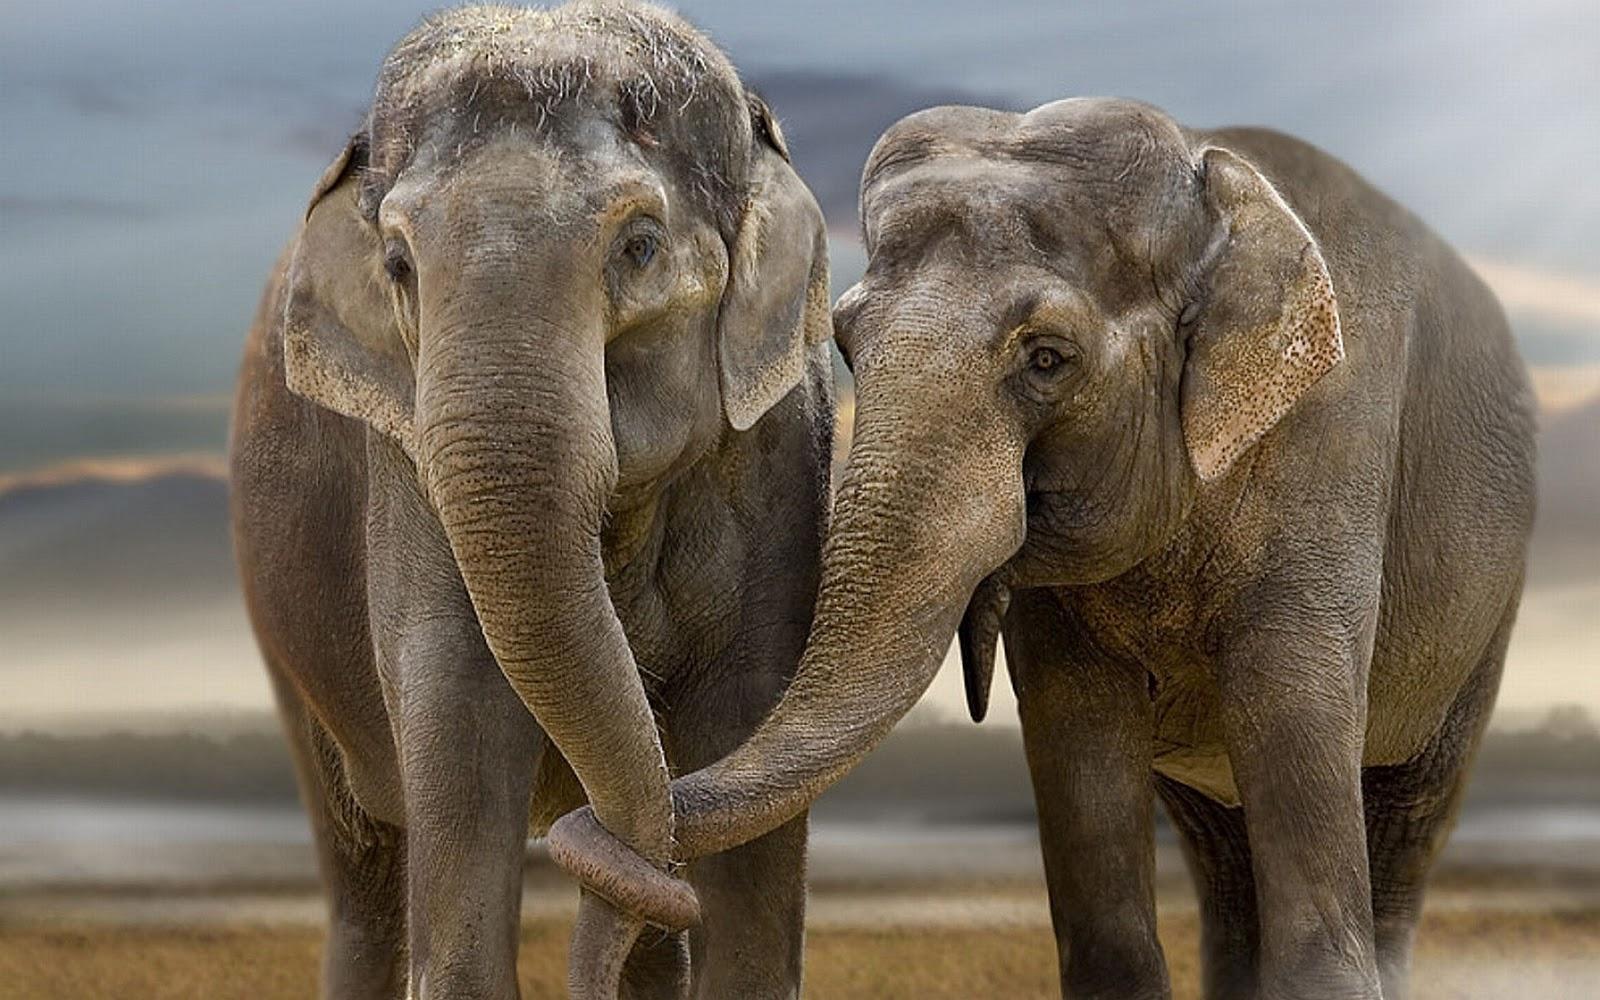 elephants wallpapers world - photo #8